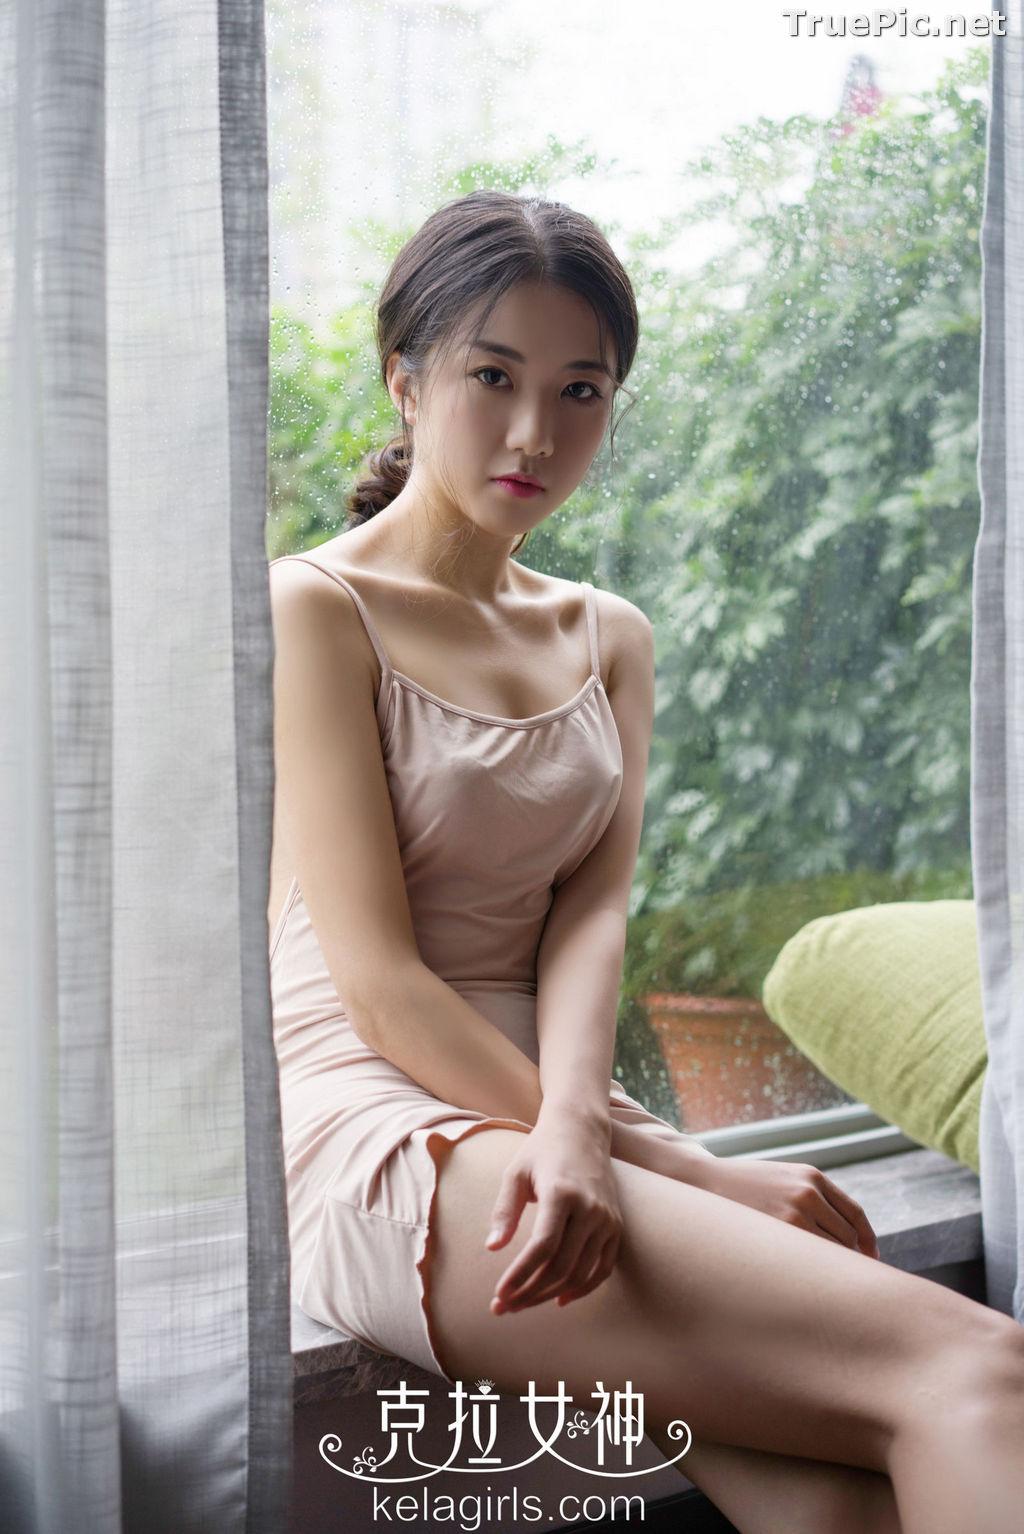 Image KelaGirls 克拉女神 – Chinese Model Ning Ning – Home School Girl Photo Album - TruePic.net - Picture-2